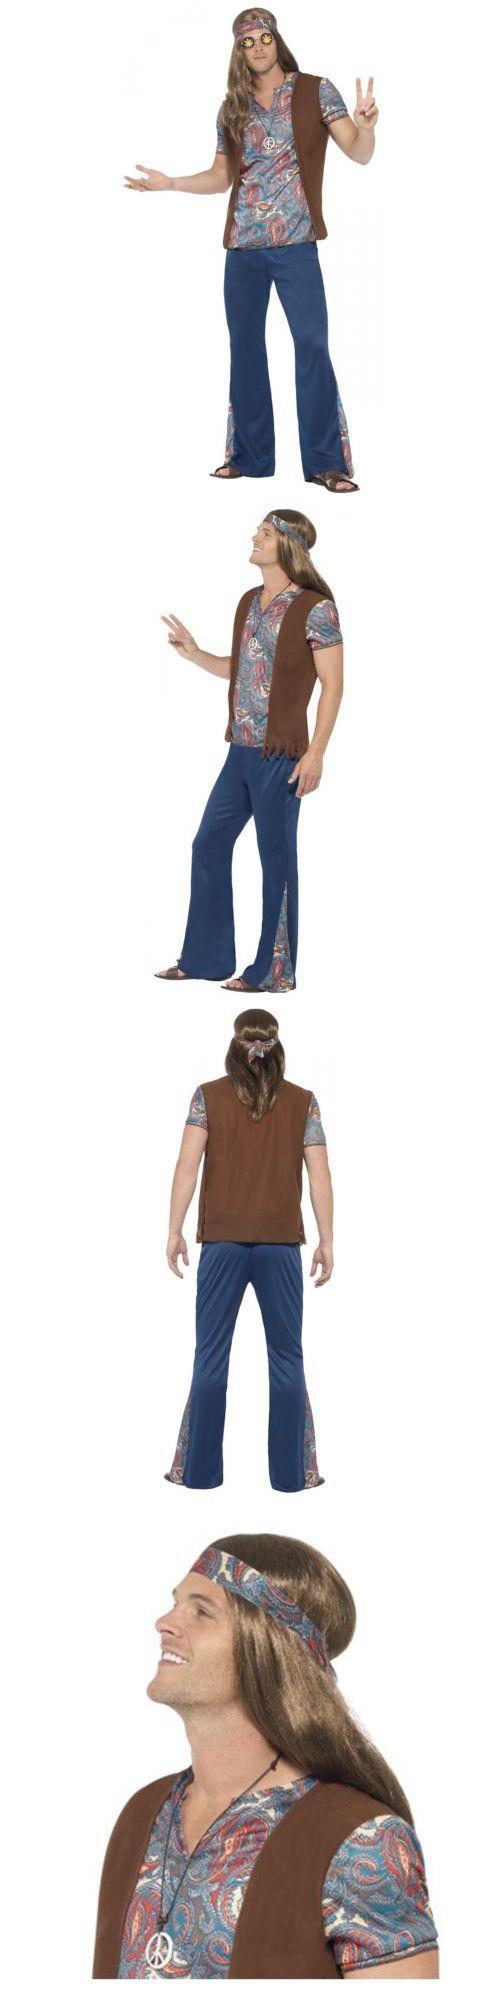 Men Costumes: Orion The Hippie Costume Halloween Fancy Dress -> BUY IT NOW ONLY: $32.59 on eBay!